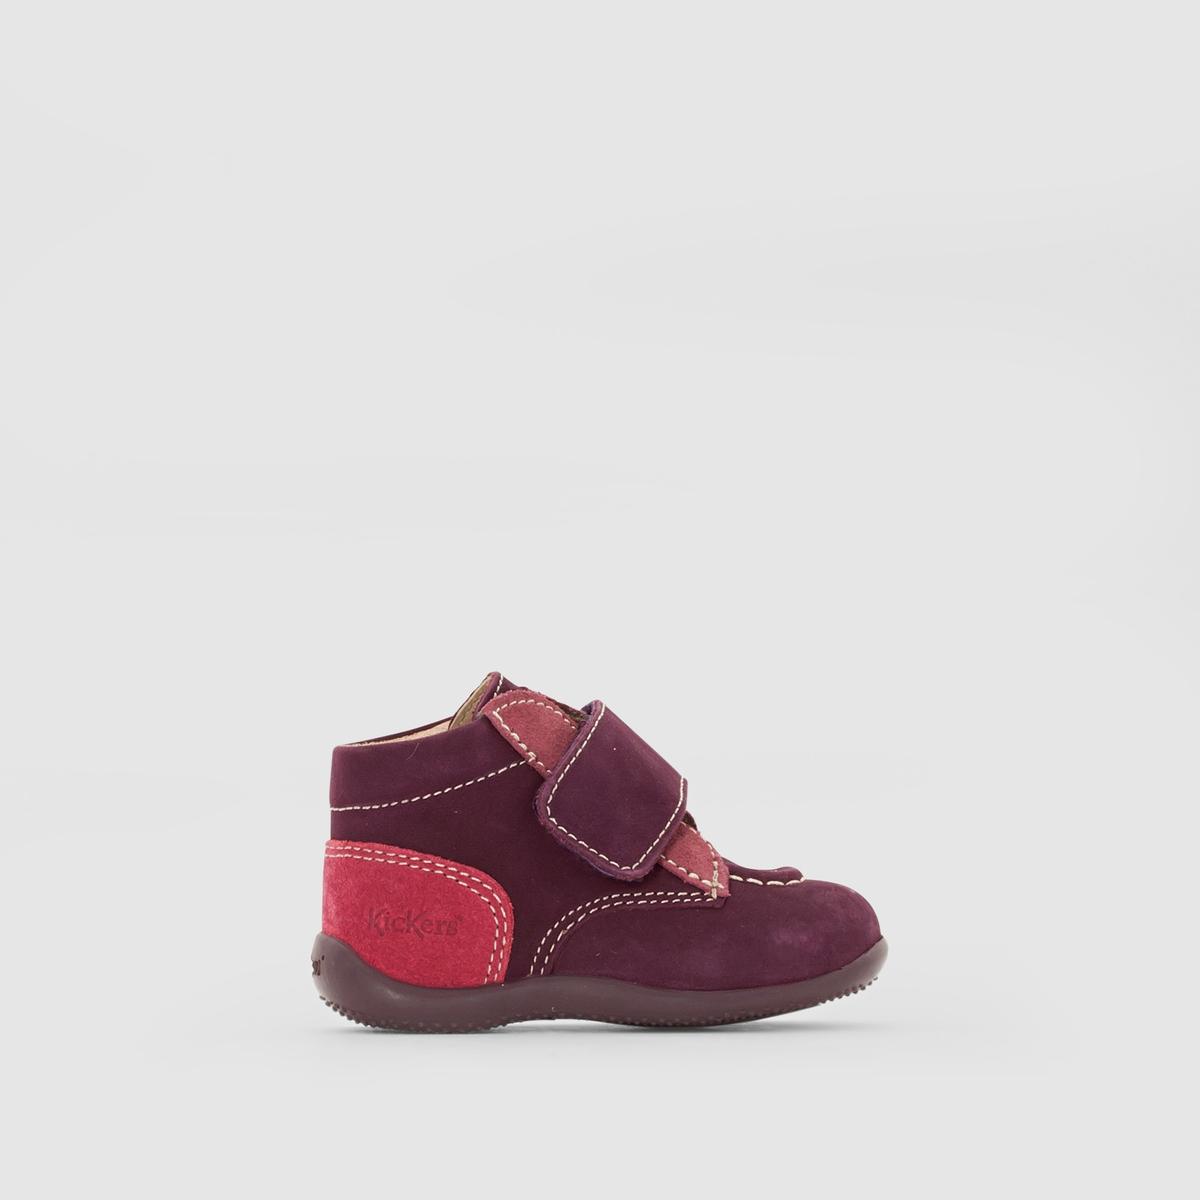 Ботинки с застежкой на планку-велкро BONO